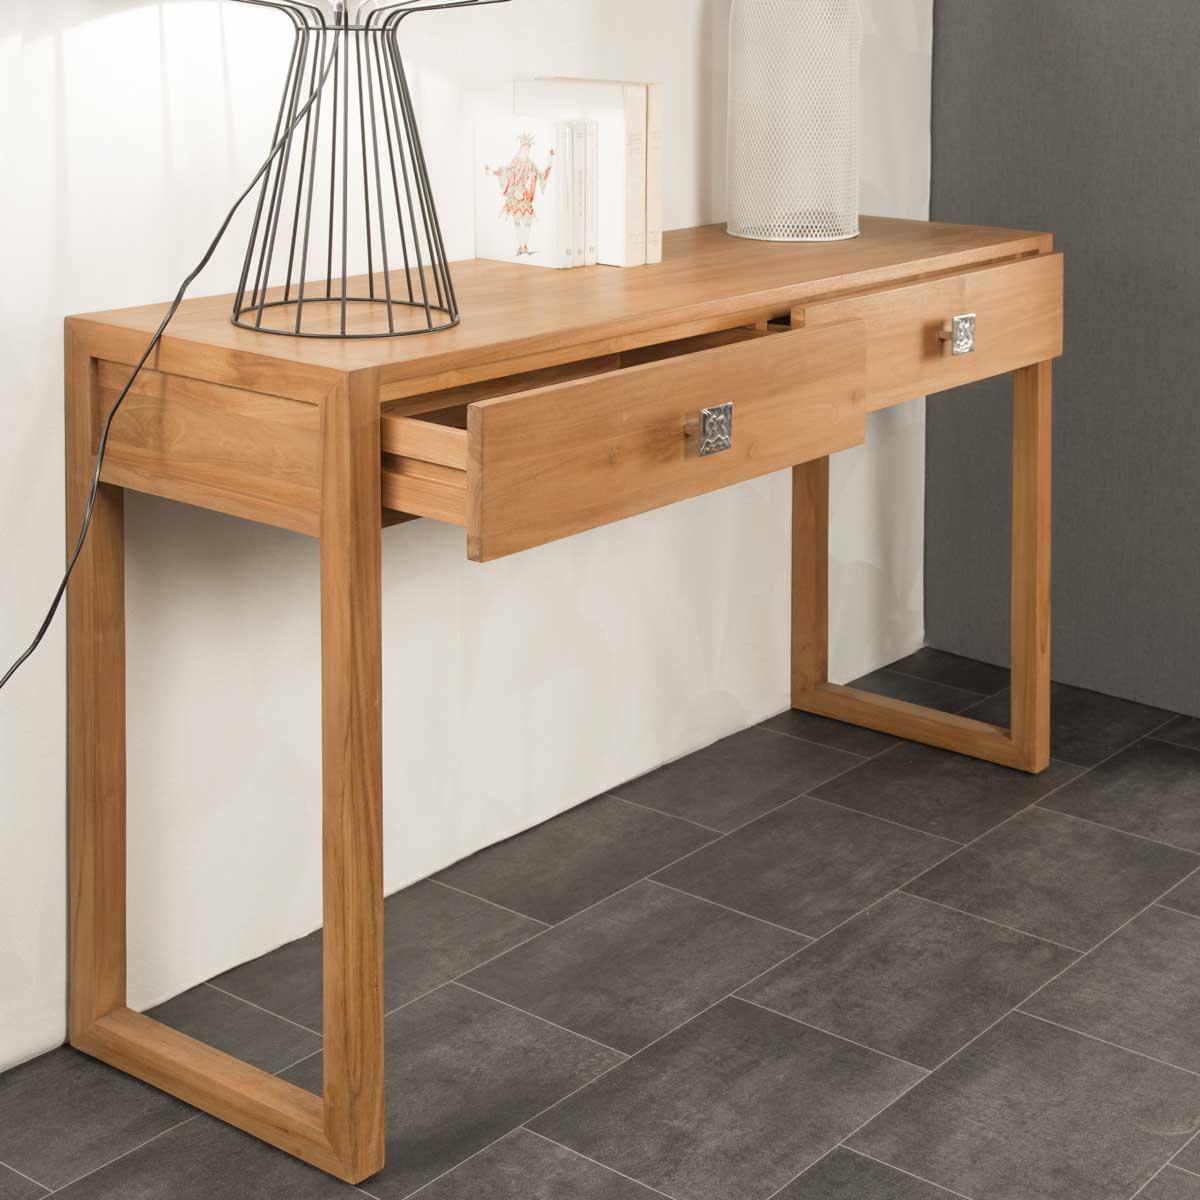 console de salon en bois de teck massif th a rectangle. Black Bedroom Furniture Sets. Home Design Ideas